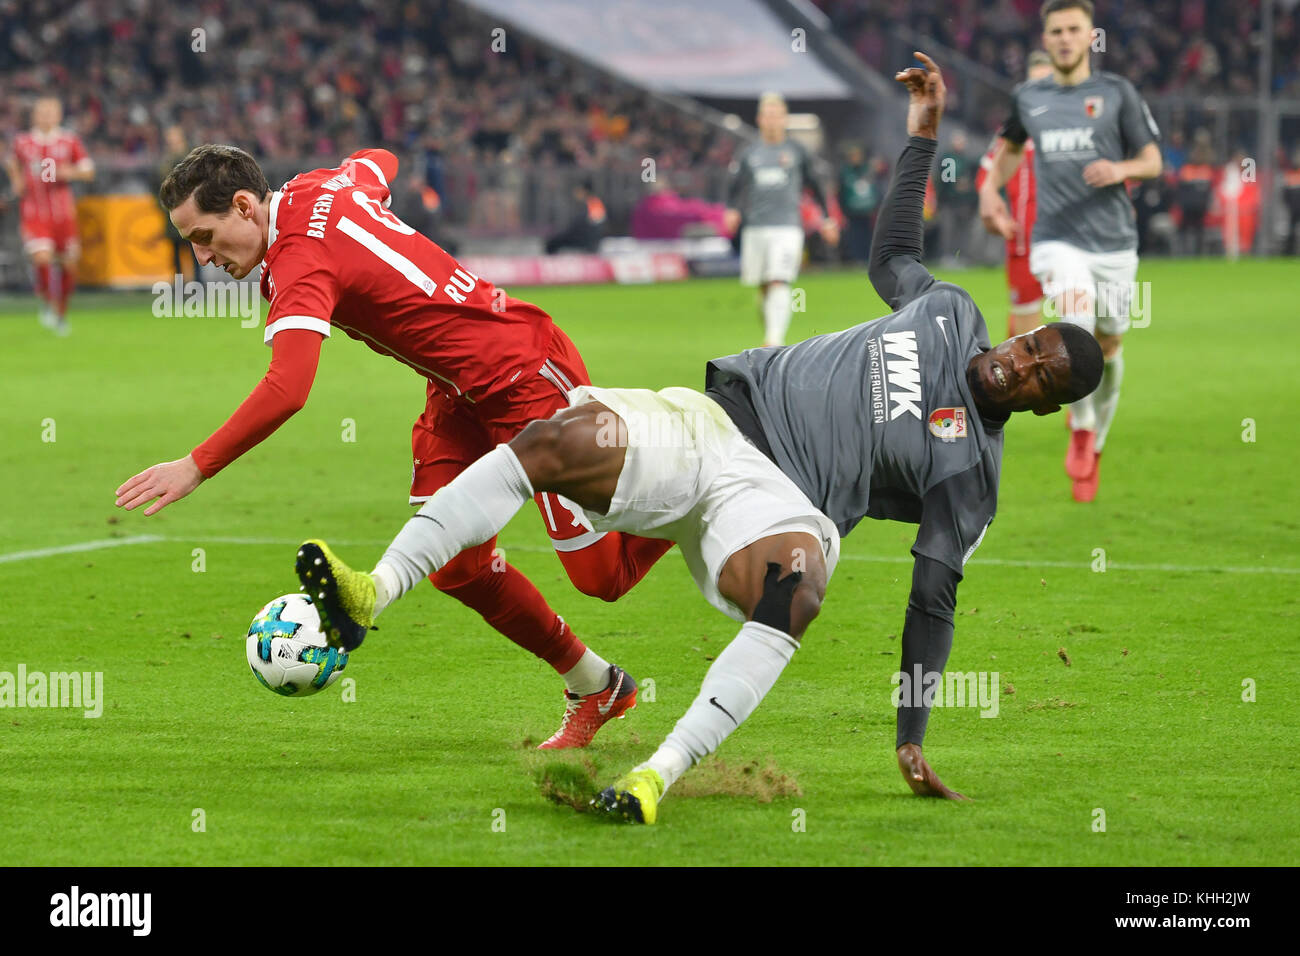 Sebastian RUDY (FC Bayern Munich), Aktion, duels versus Daniel OPARE (FC Augsburg). Fussball 1. Bundesliga, 12.Spieltag, - Stock Image